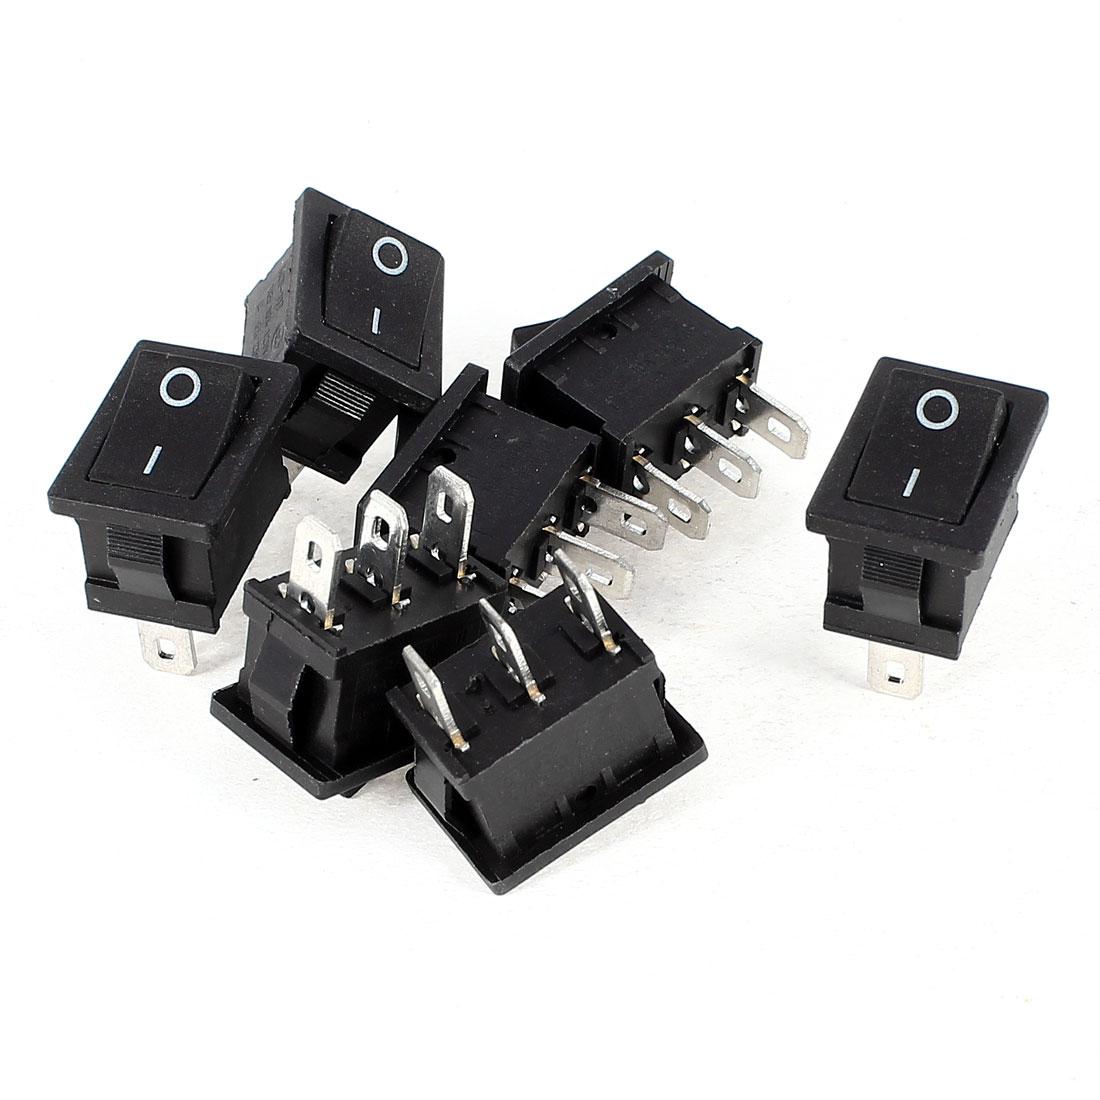 AC 250V 6A AC 125V 10A 3 Terminals SPDT 2 Positions Rocker Switch Black 7 Pieces